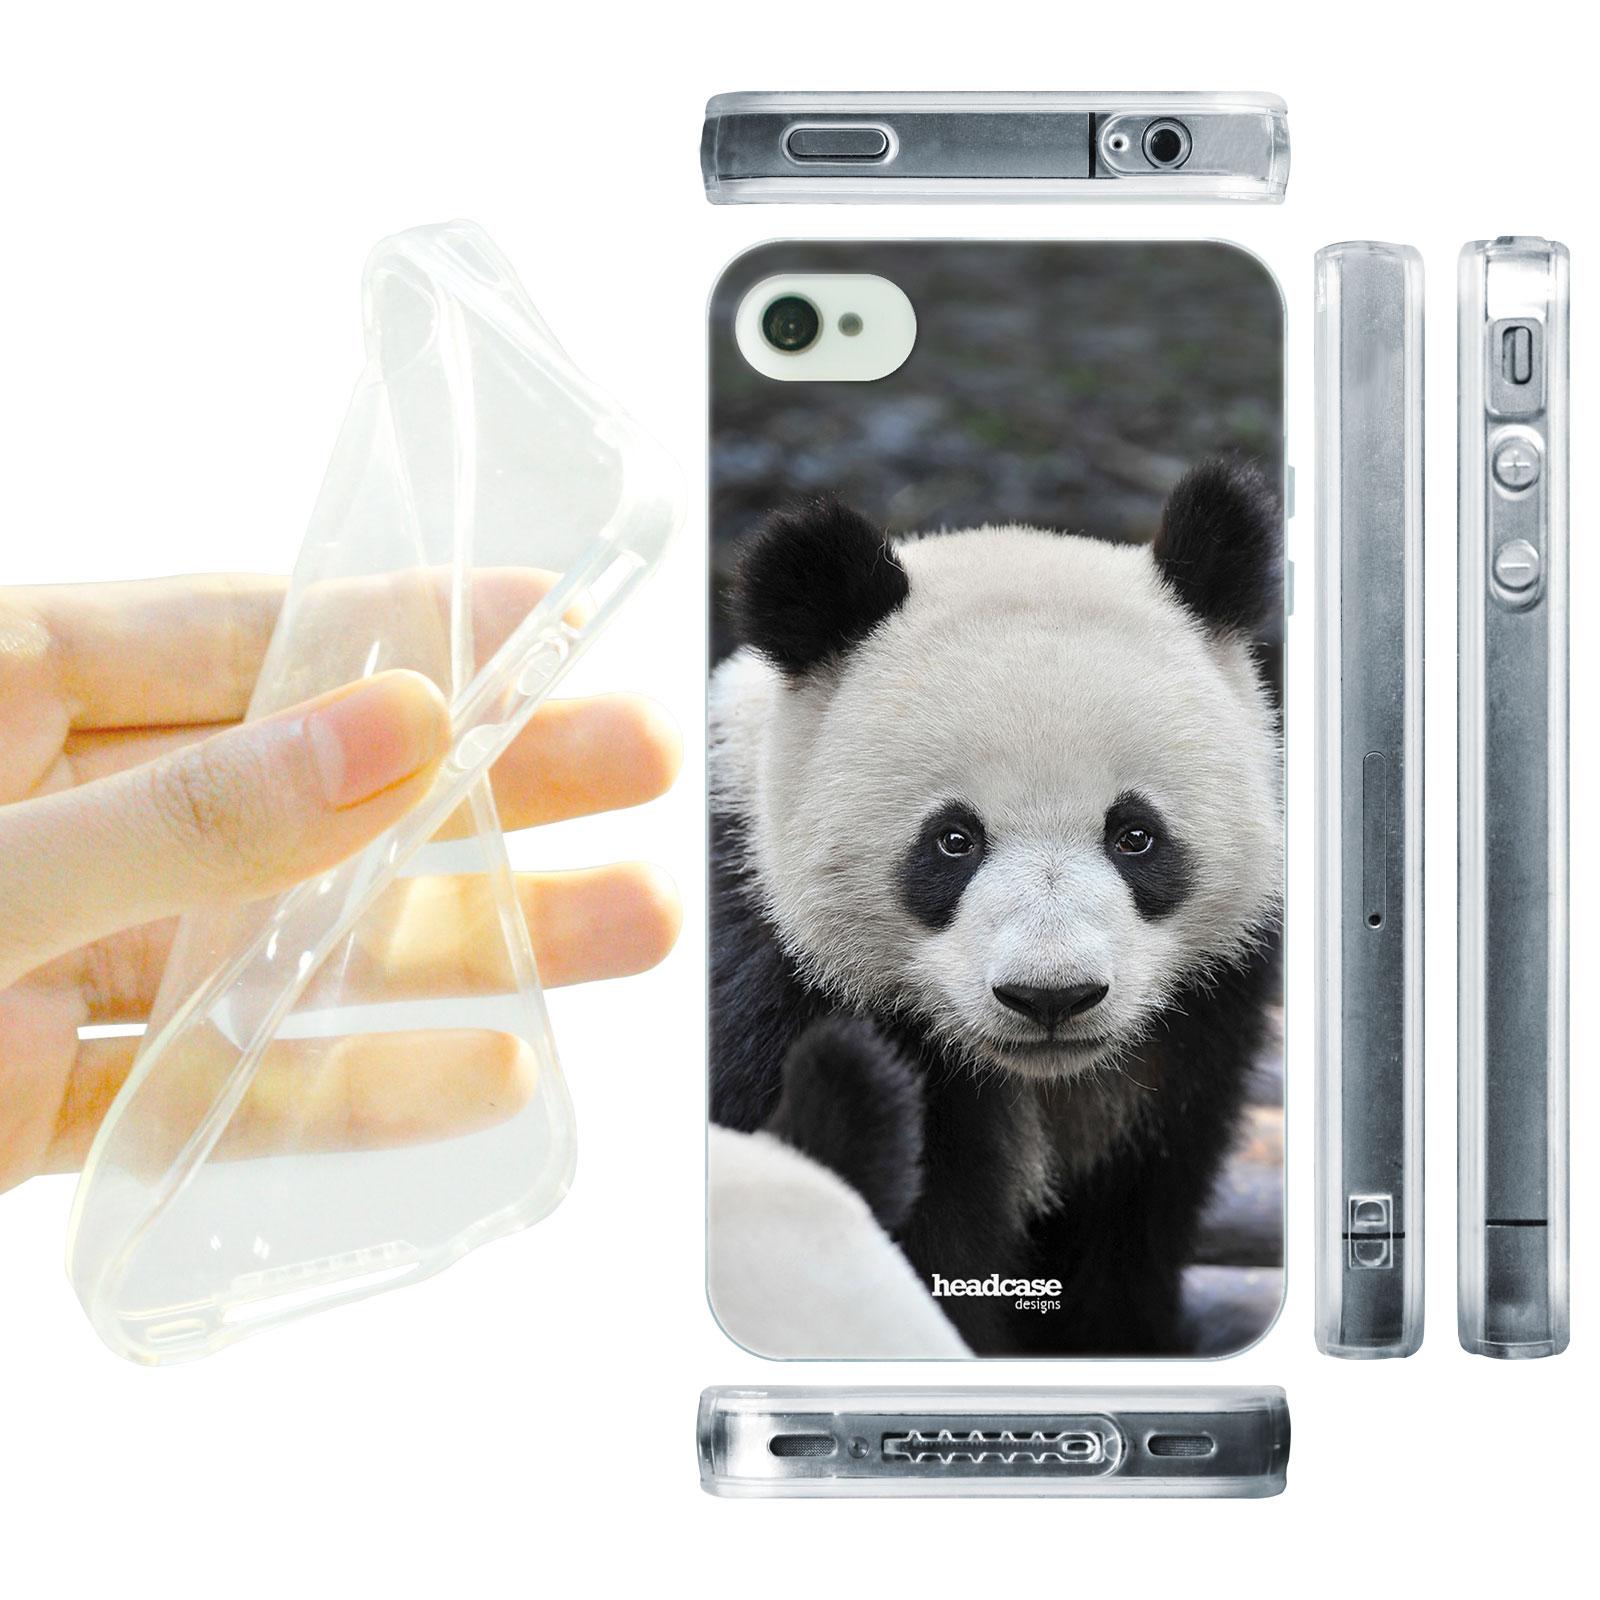 HEAD CASE silikonový obal na mobil Iphone 4 4S divočina černá a bílá barva  medvídek empty 280d9ae4d0a